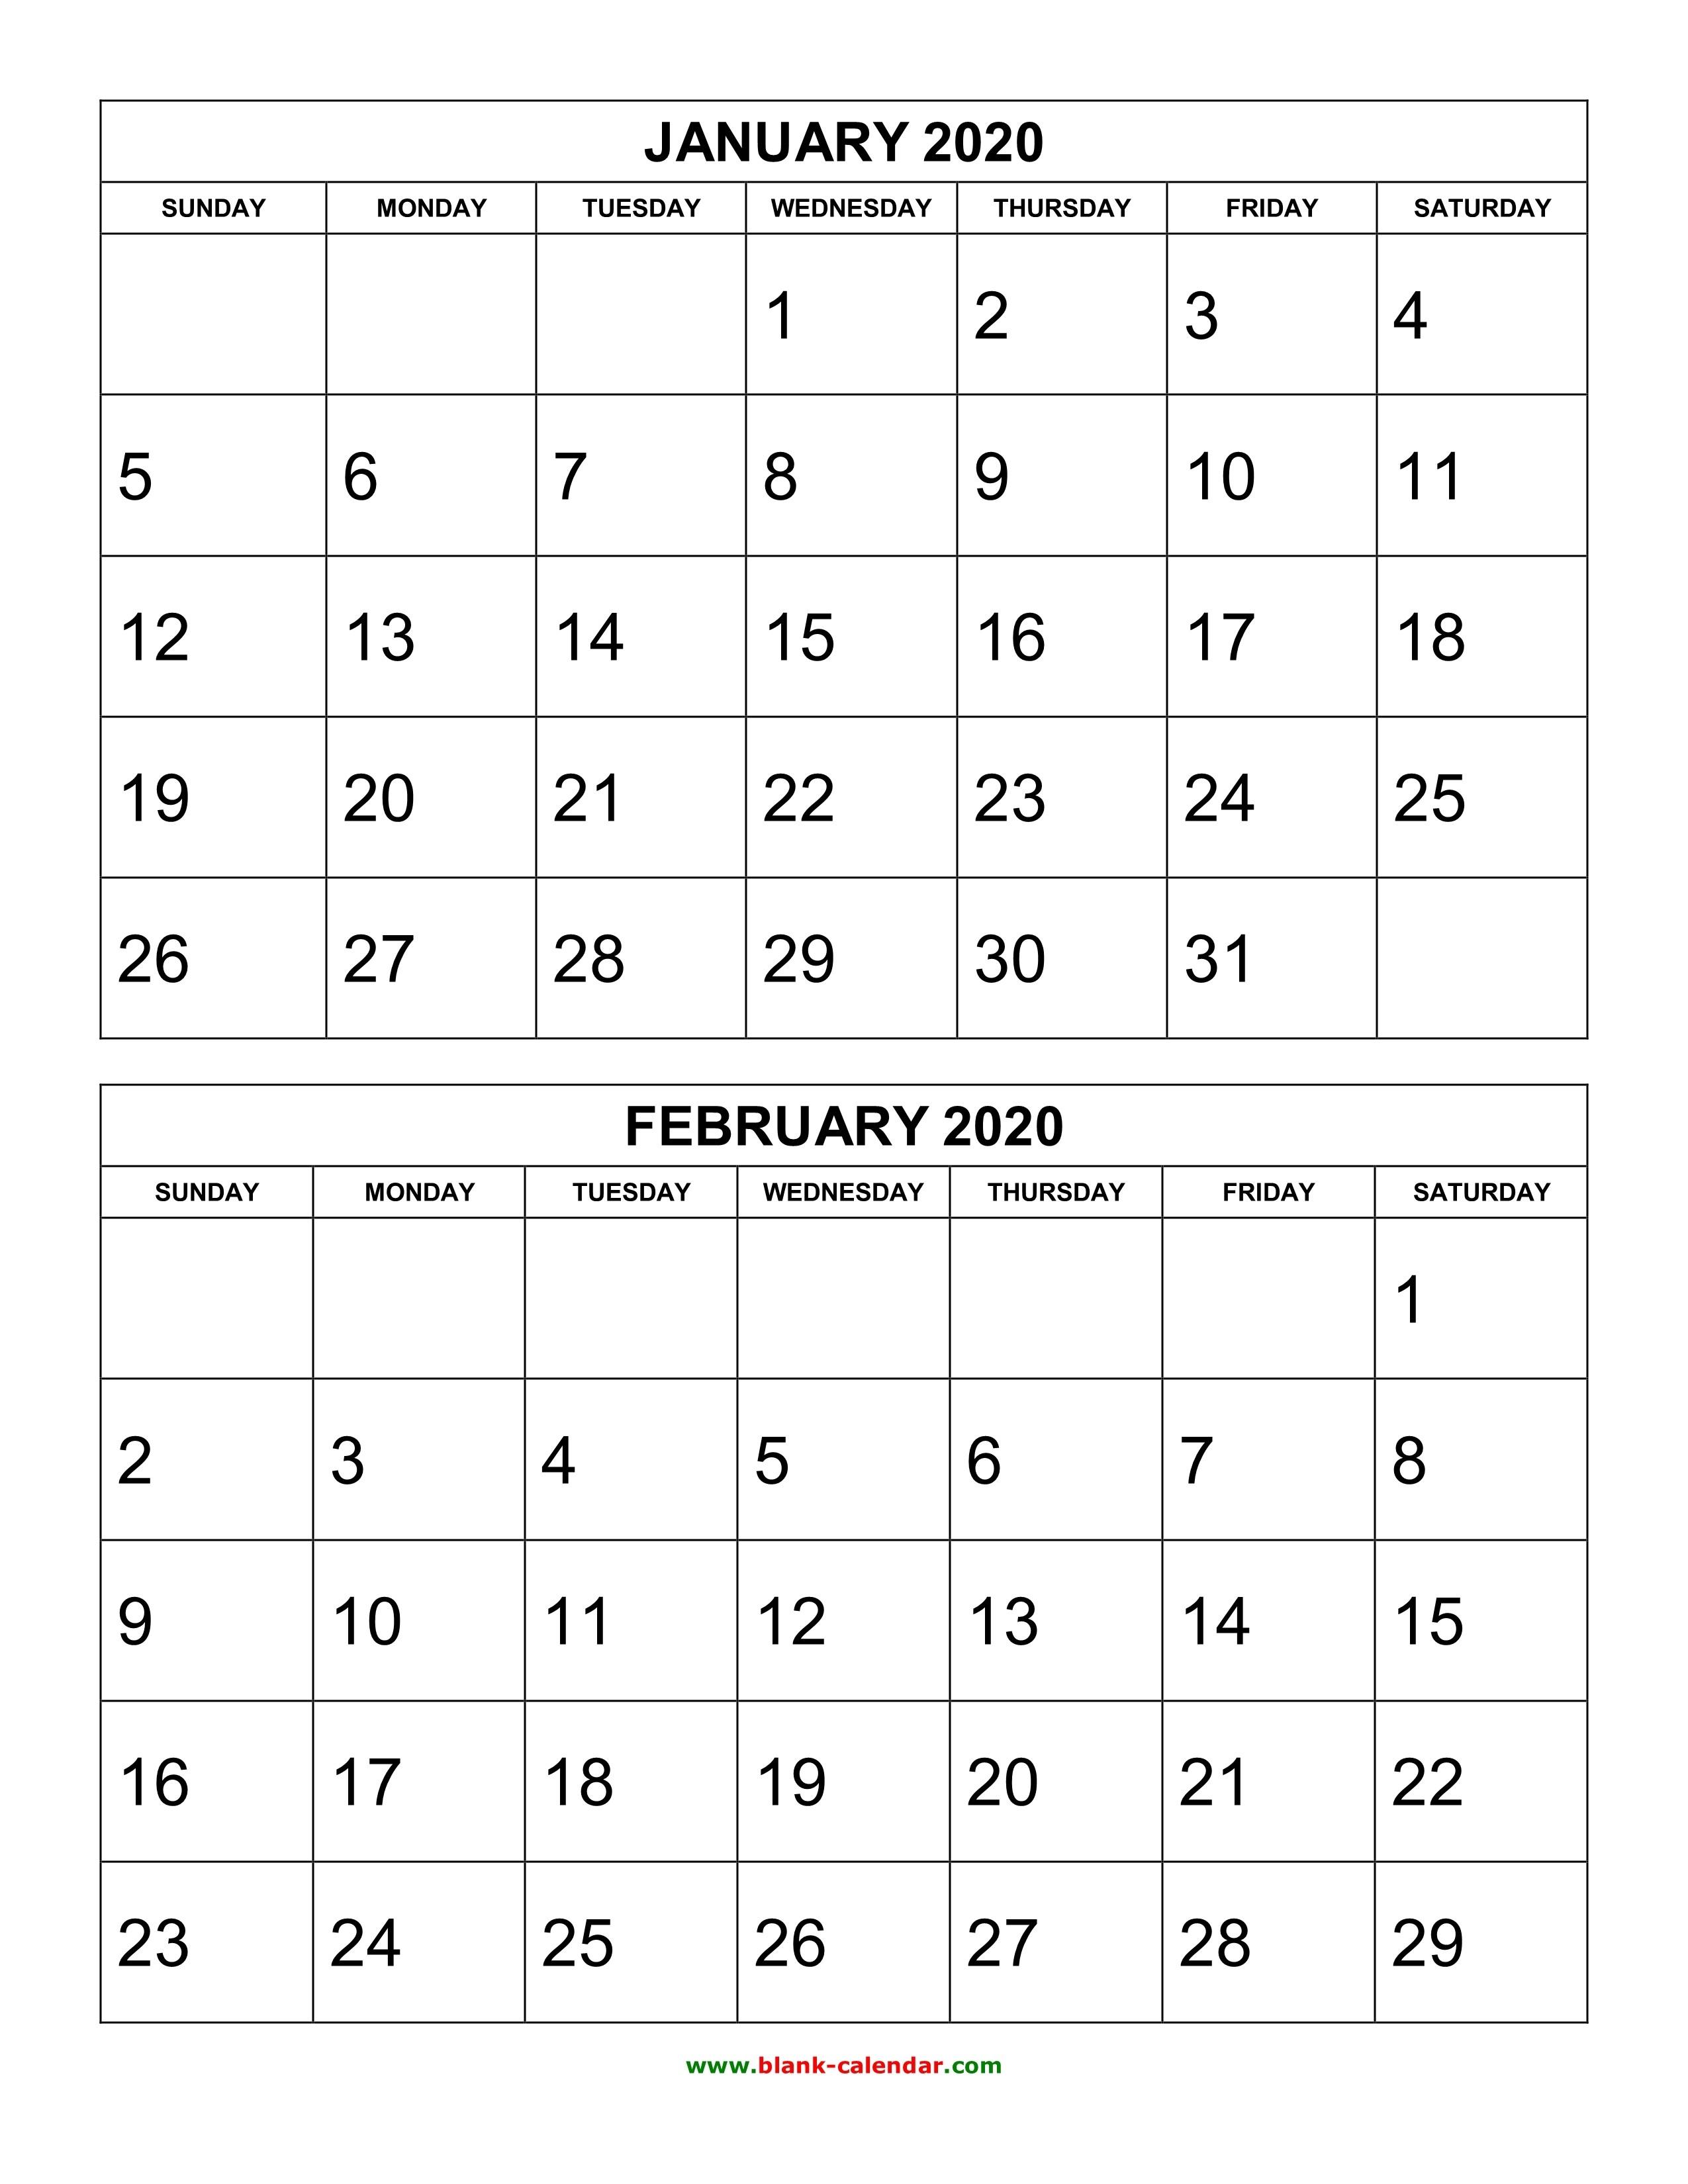 Free Download Printable Calendar 2020, 2 Months Per Page, 6-6 Month Blank Calendar 2020